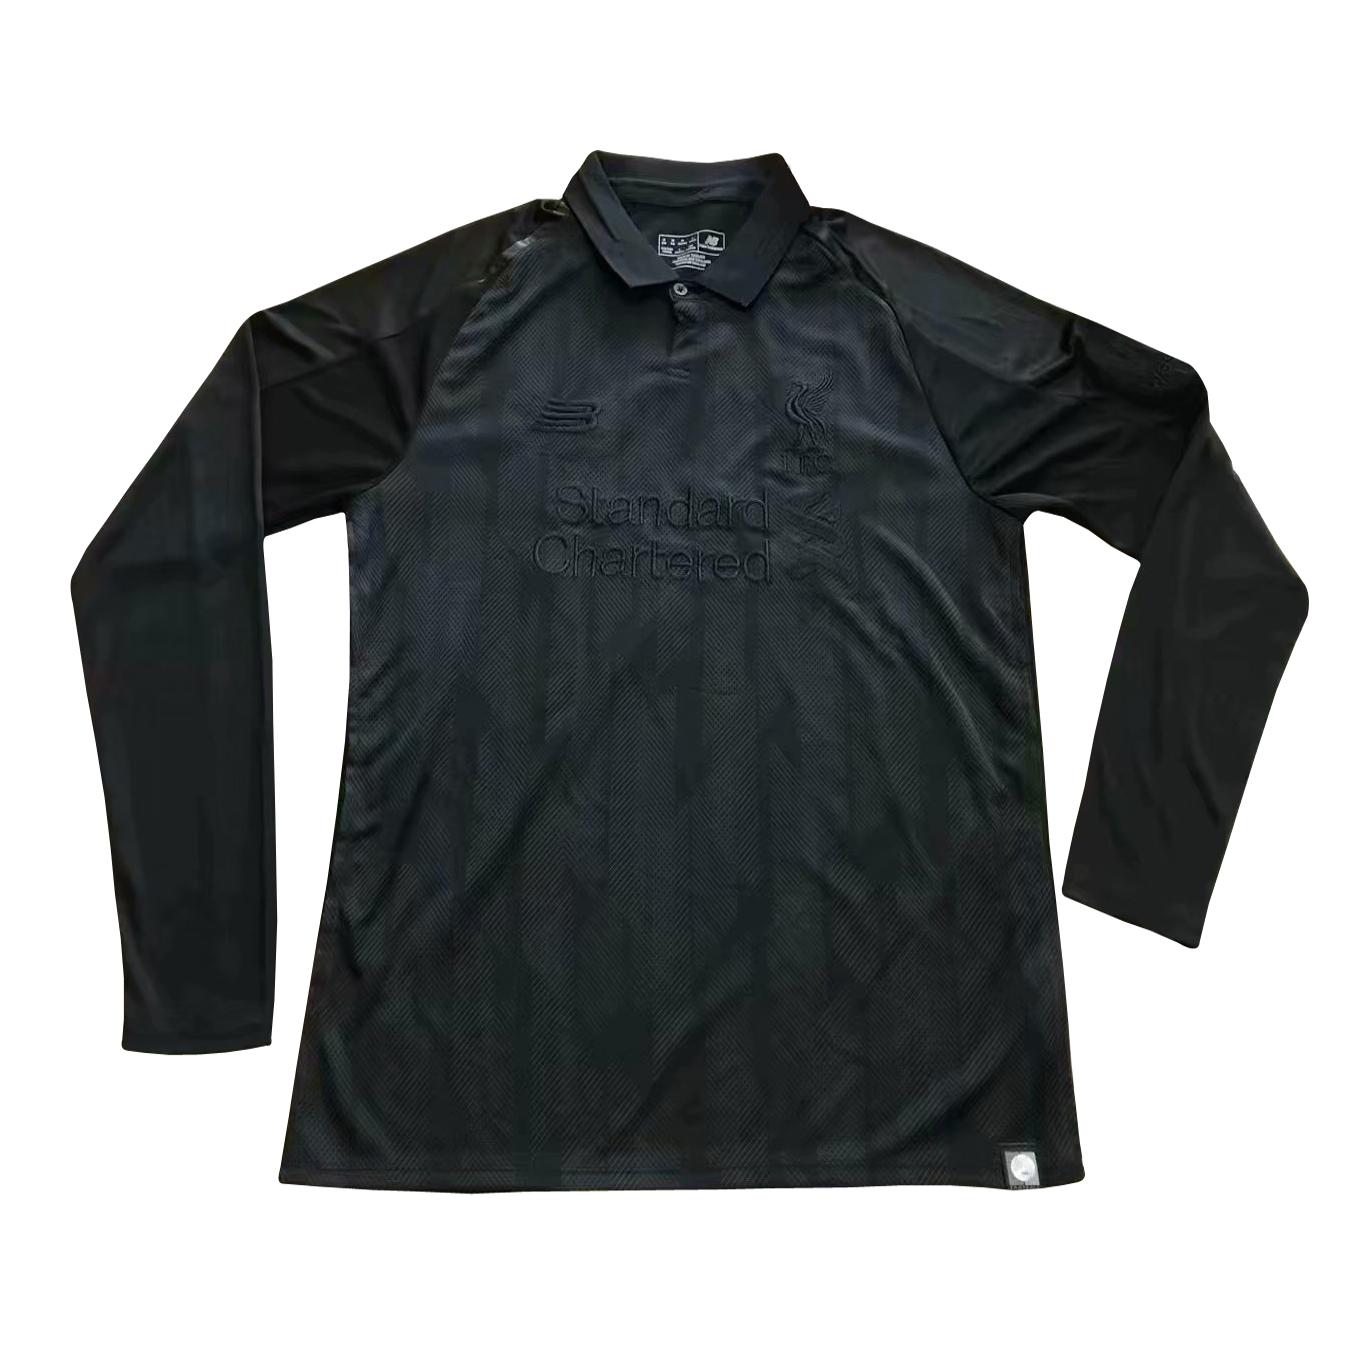 2de437061 US  16.8 - Liverpool Vintage Limited Edition Black Jersey Long Sleeve Men s  2018 19 - www.fcsoccerworld.com